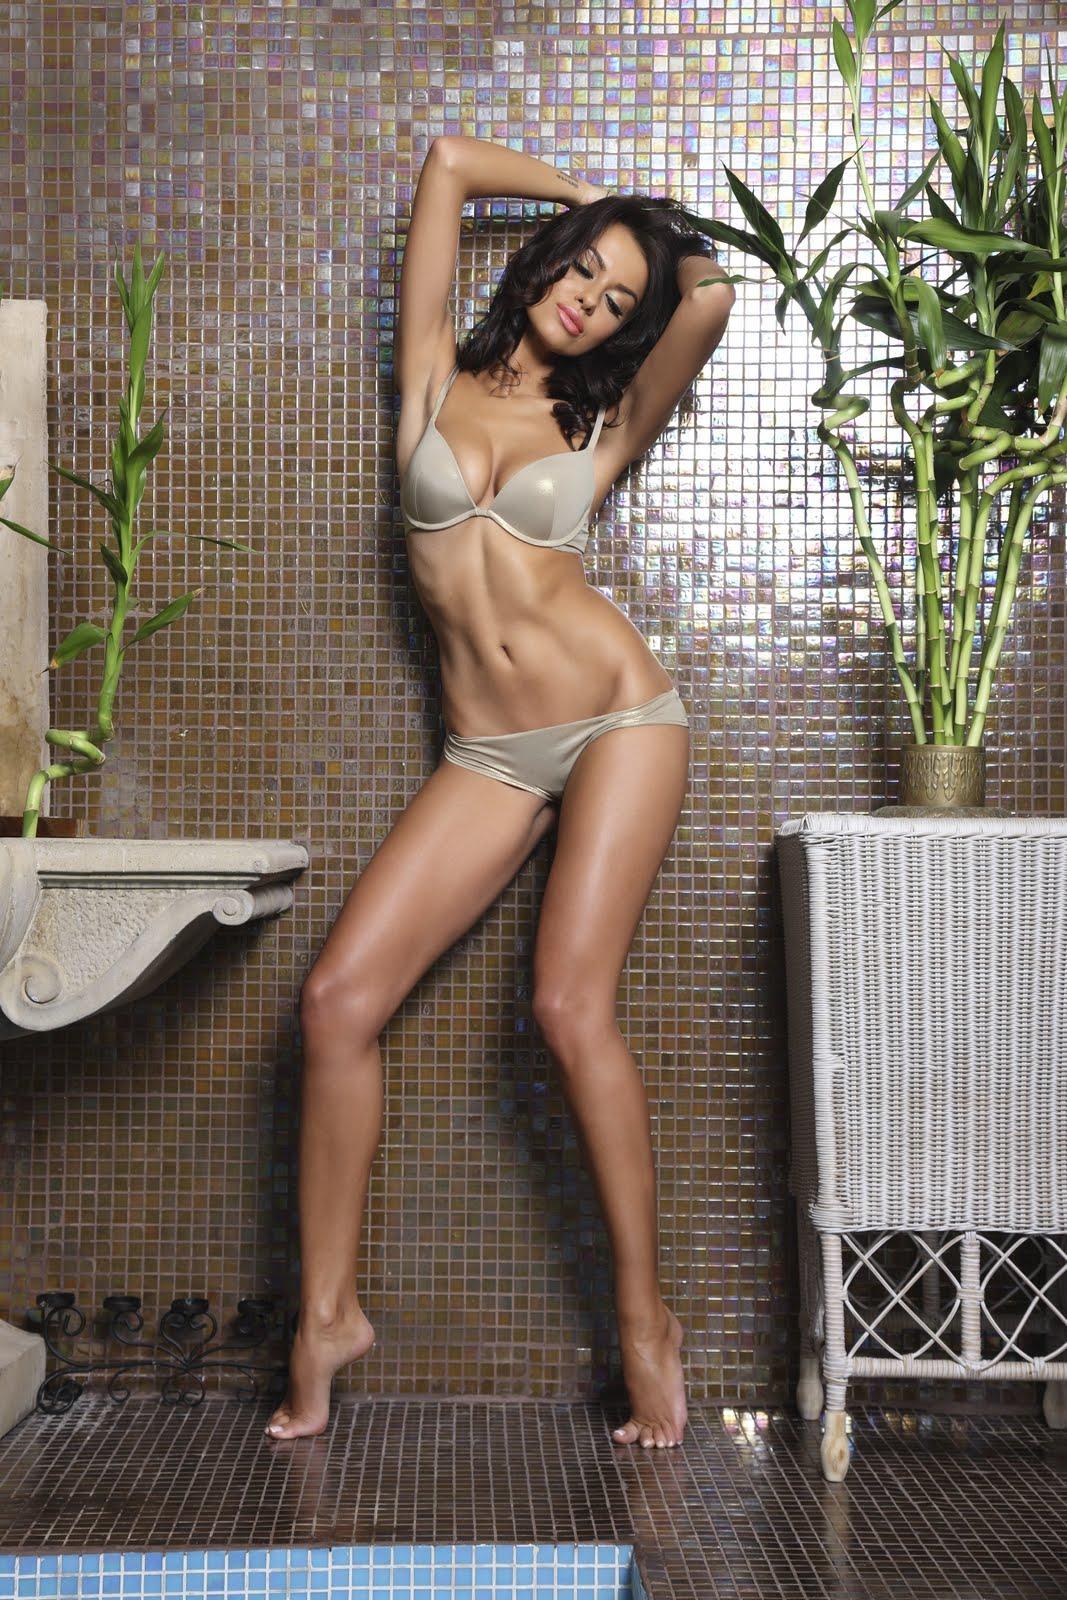 http://4.bp.blogspot.com/-O--O1Q0Qm1I/TfSP3-1MIDI/AAAAAAAAC1o/4UIXblIm39I/s1600/Natalia+Siwiec+hot+wallpaper7.jpg